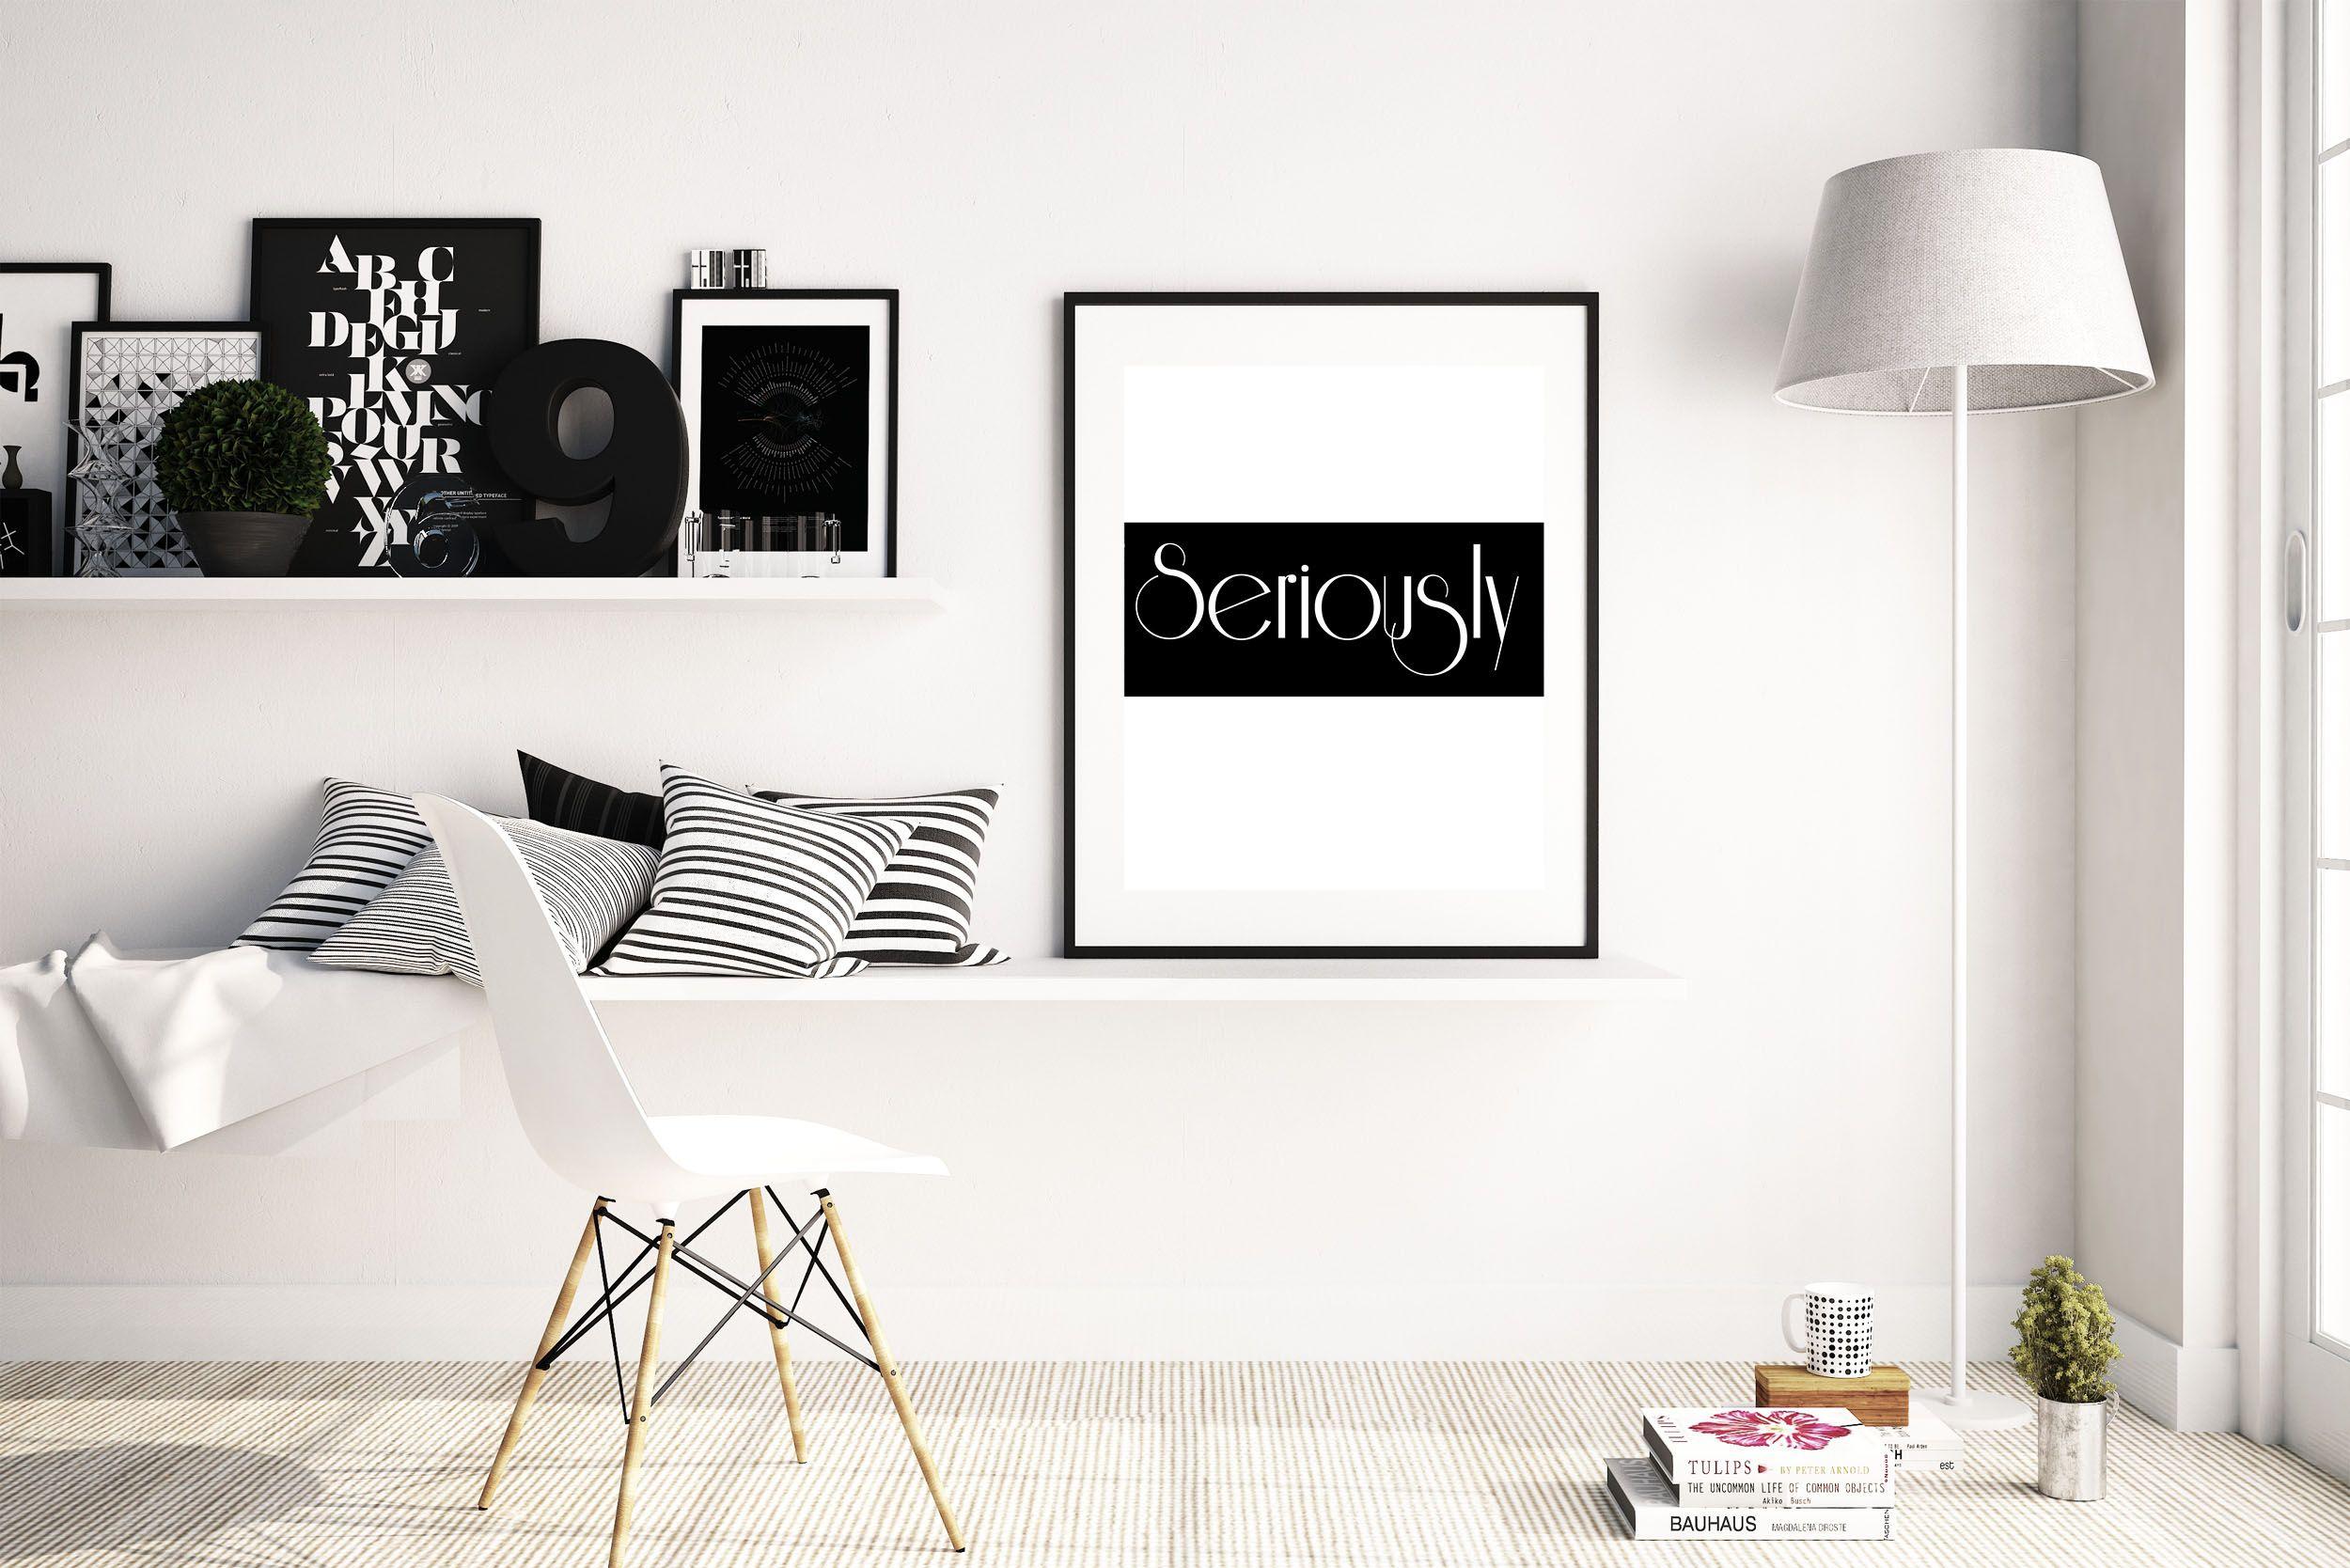 Seriously Poster Apartment Decor Ideas